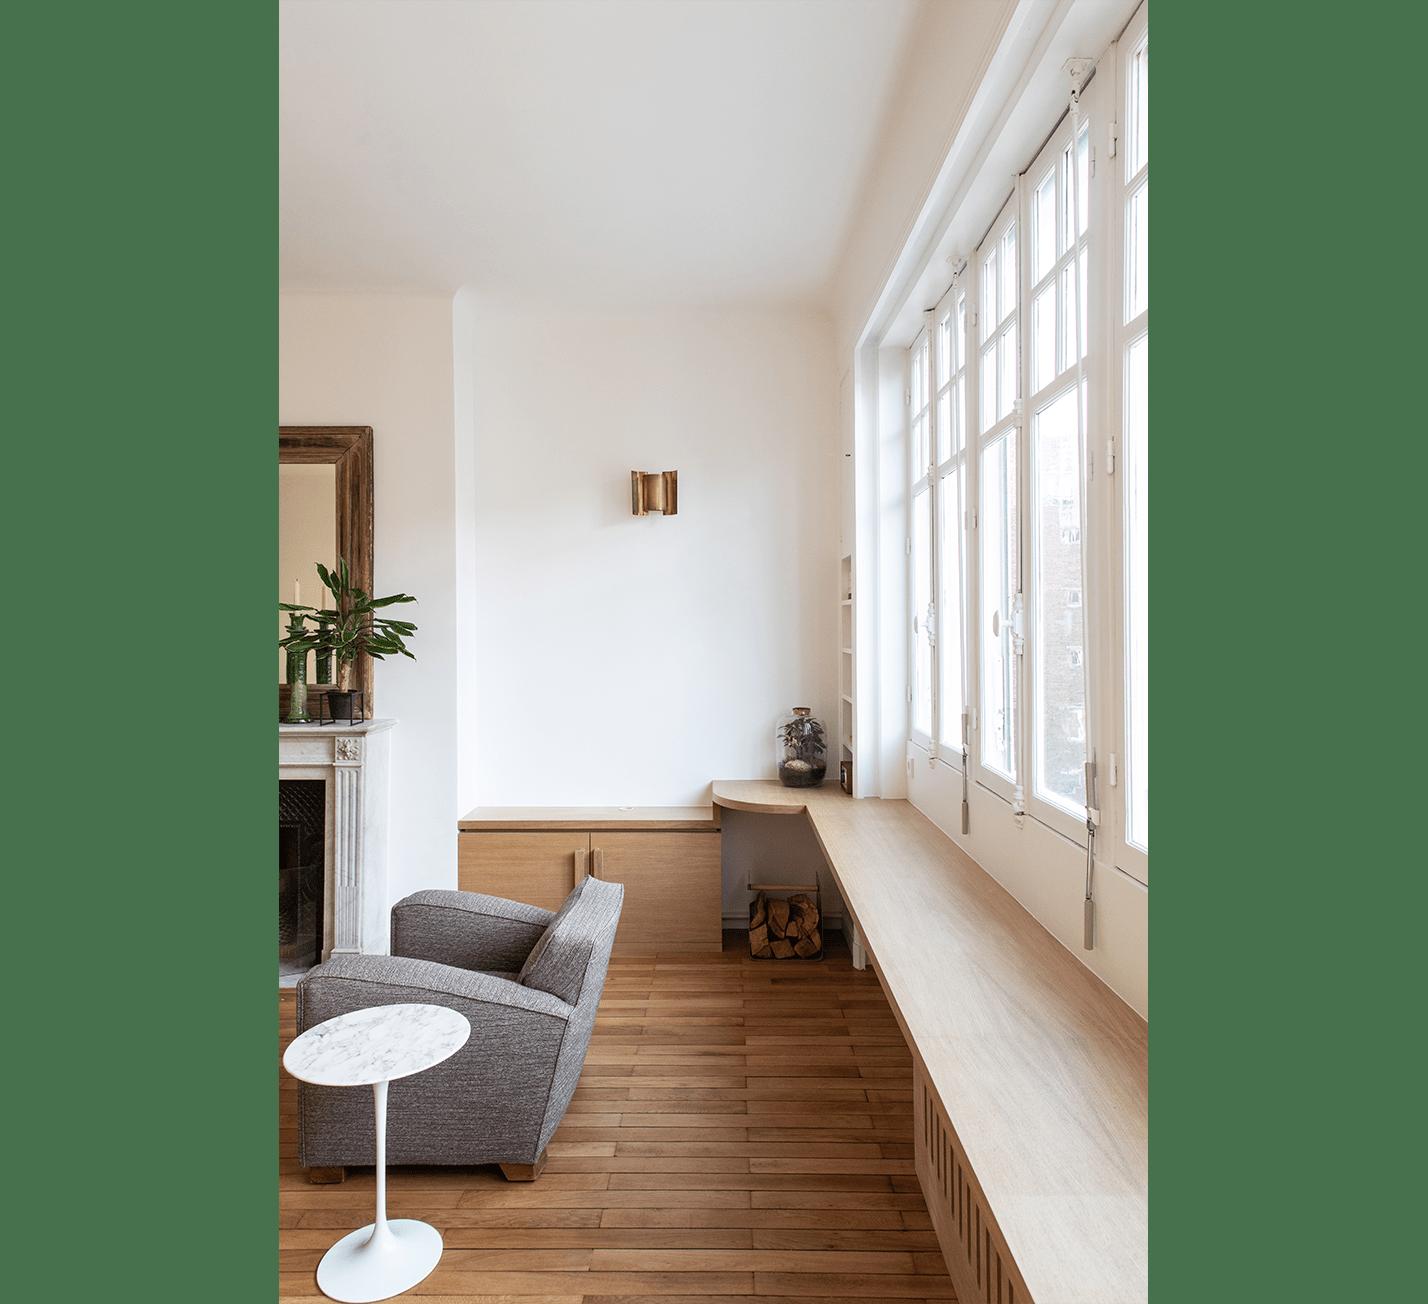 Projet-Emile-Atelier-Steve-Pauline-Borgia-Architecte-interieur-04-min